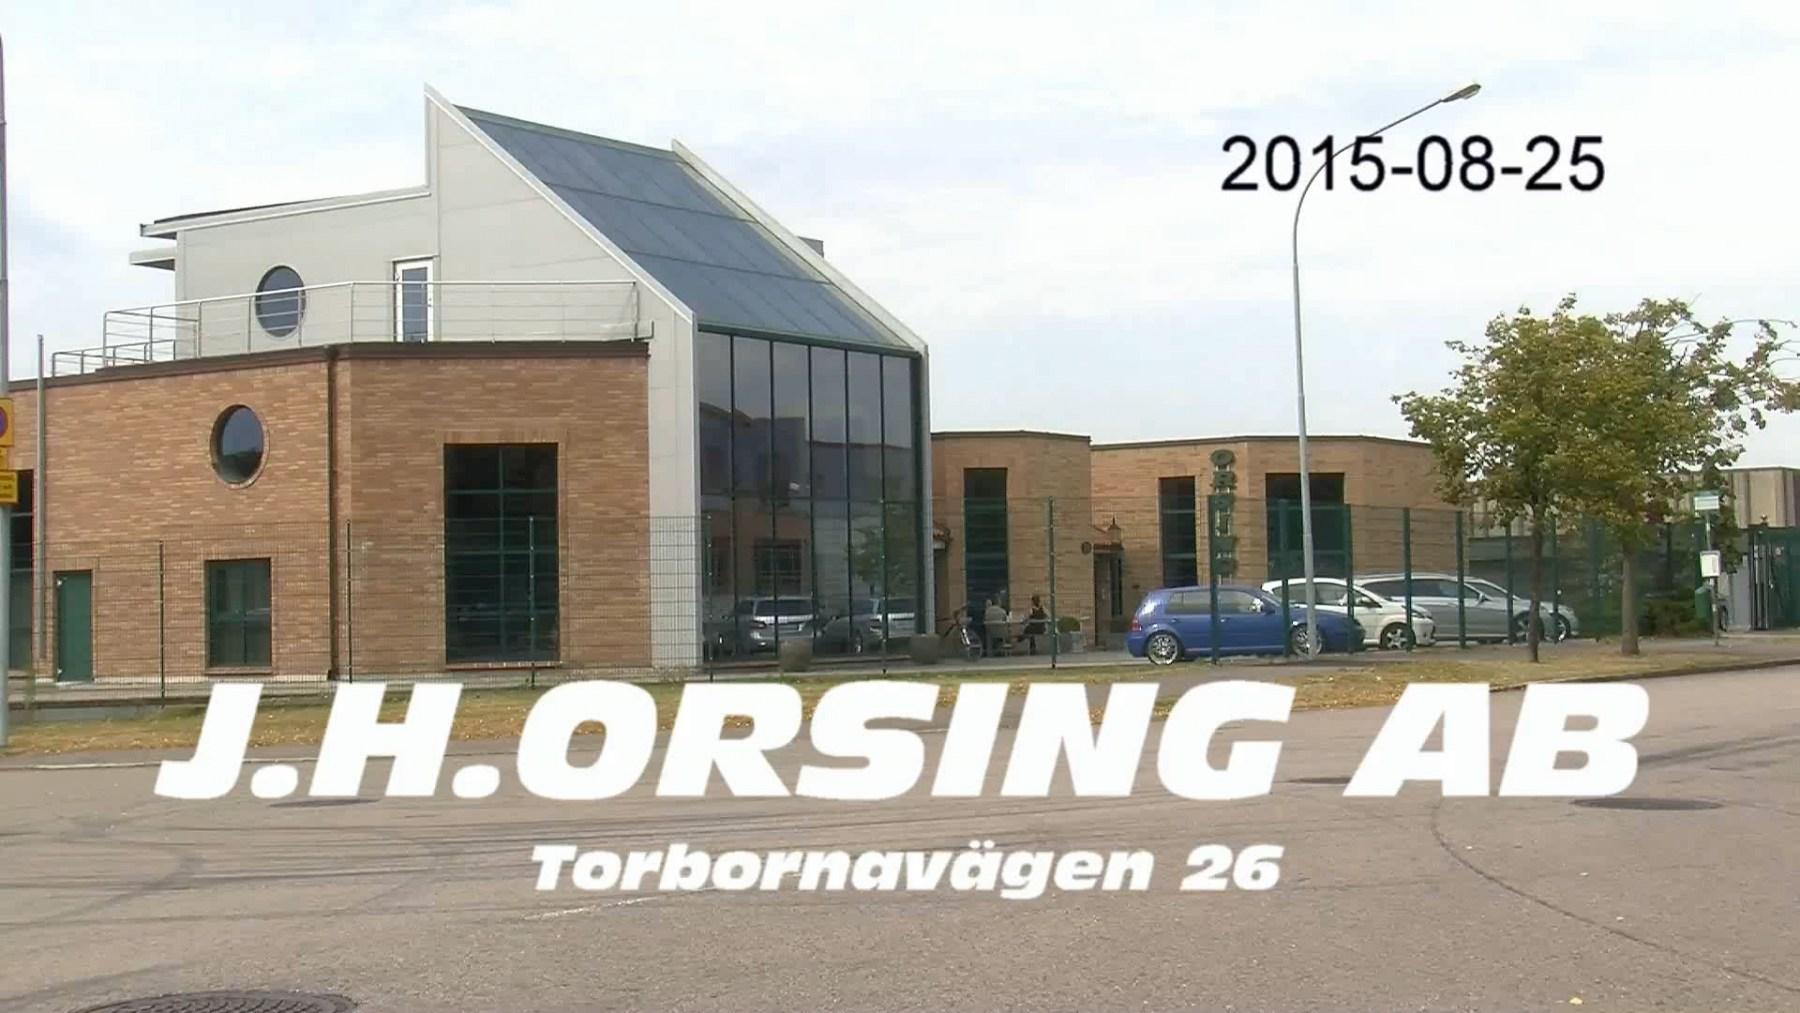 J.H.Orsing-AB